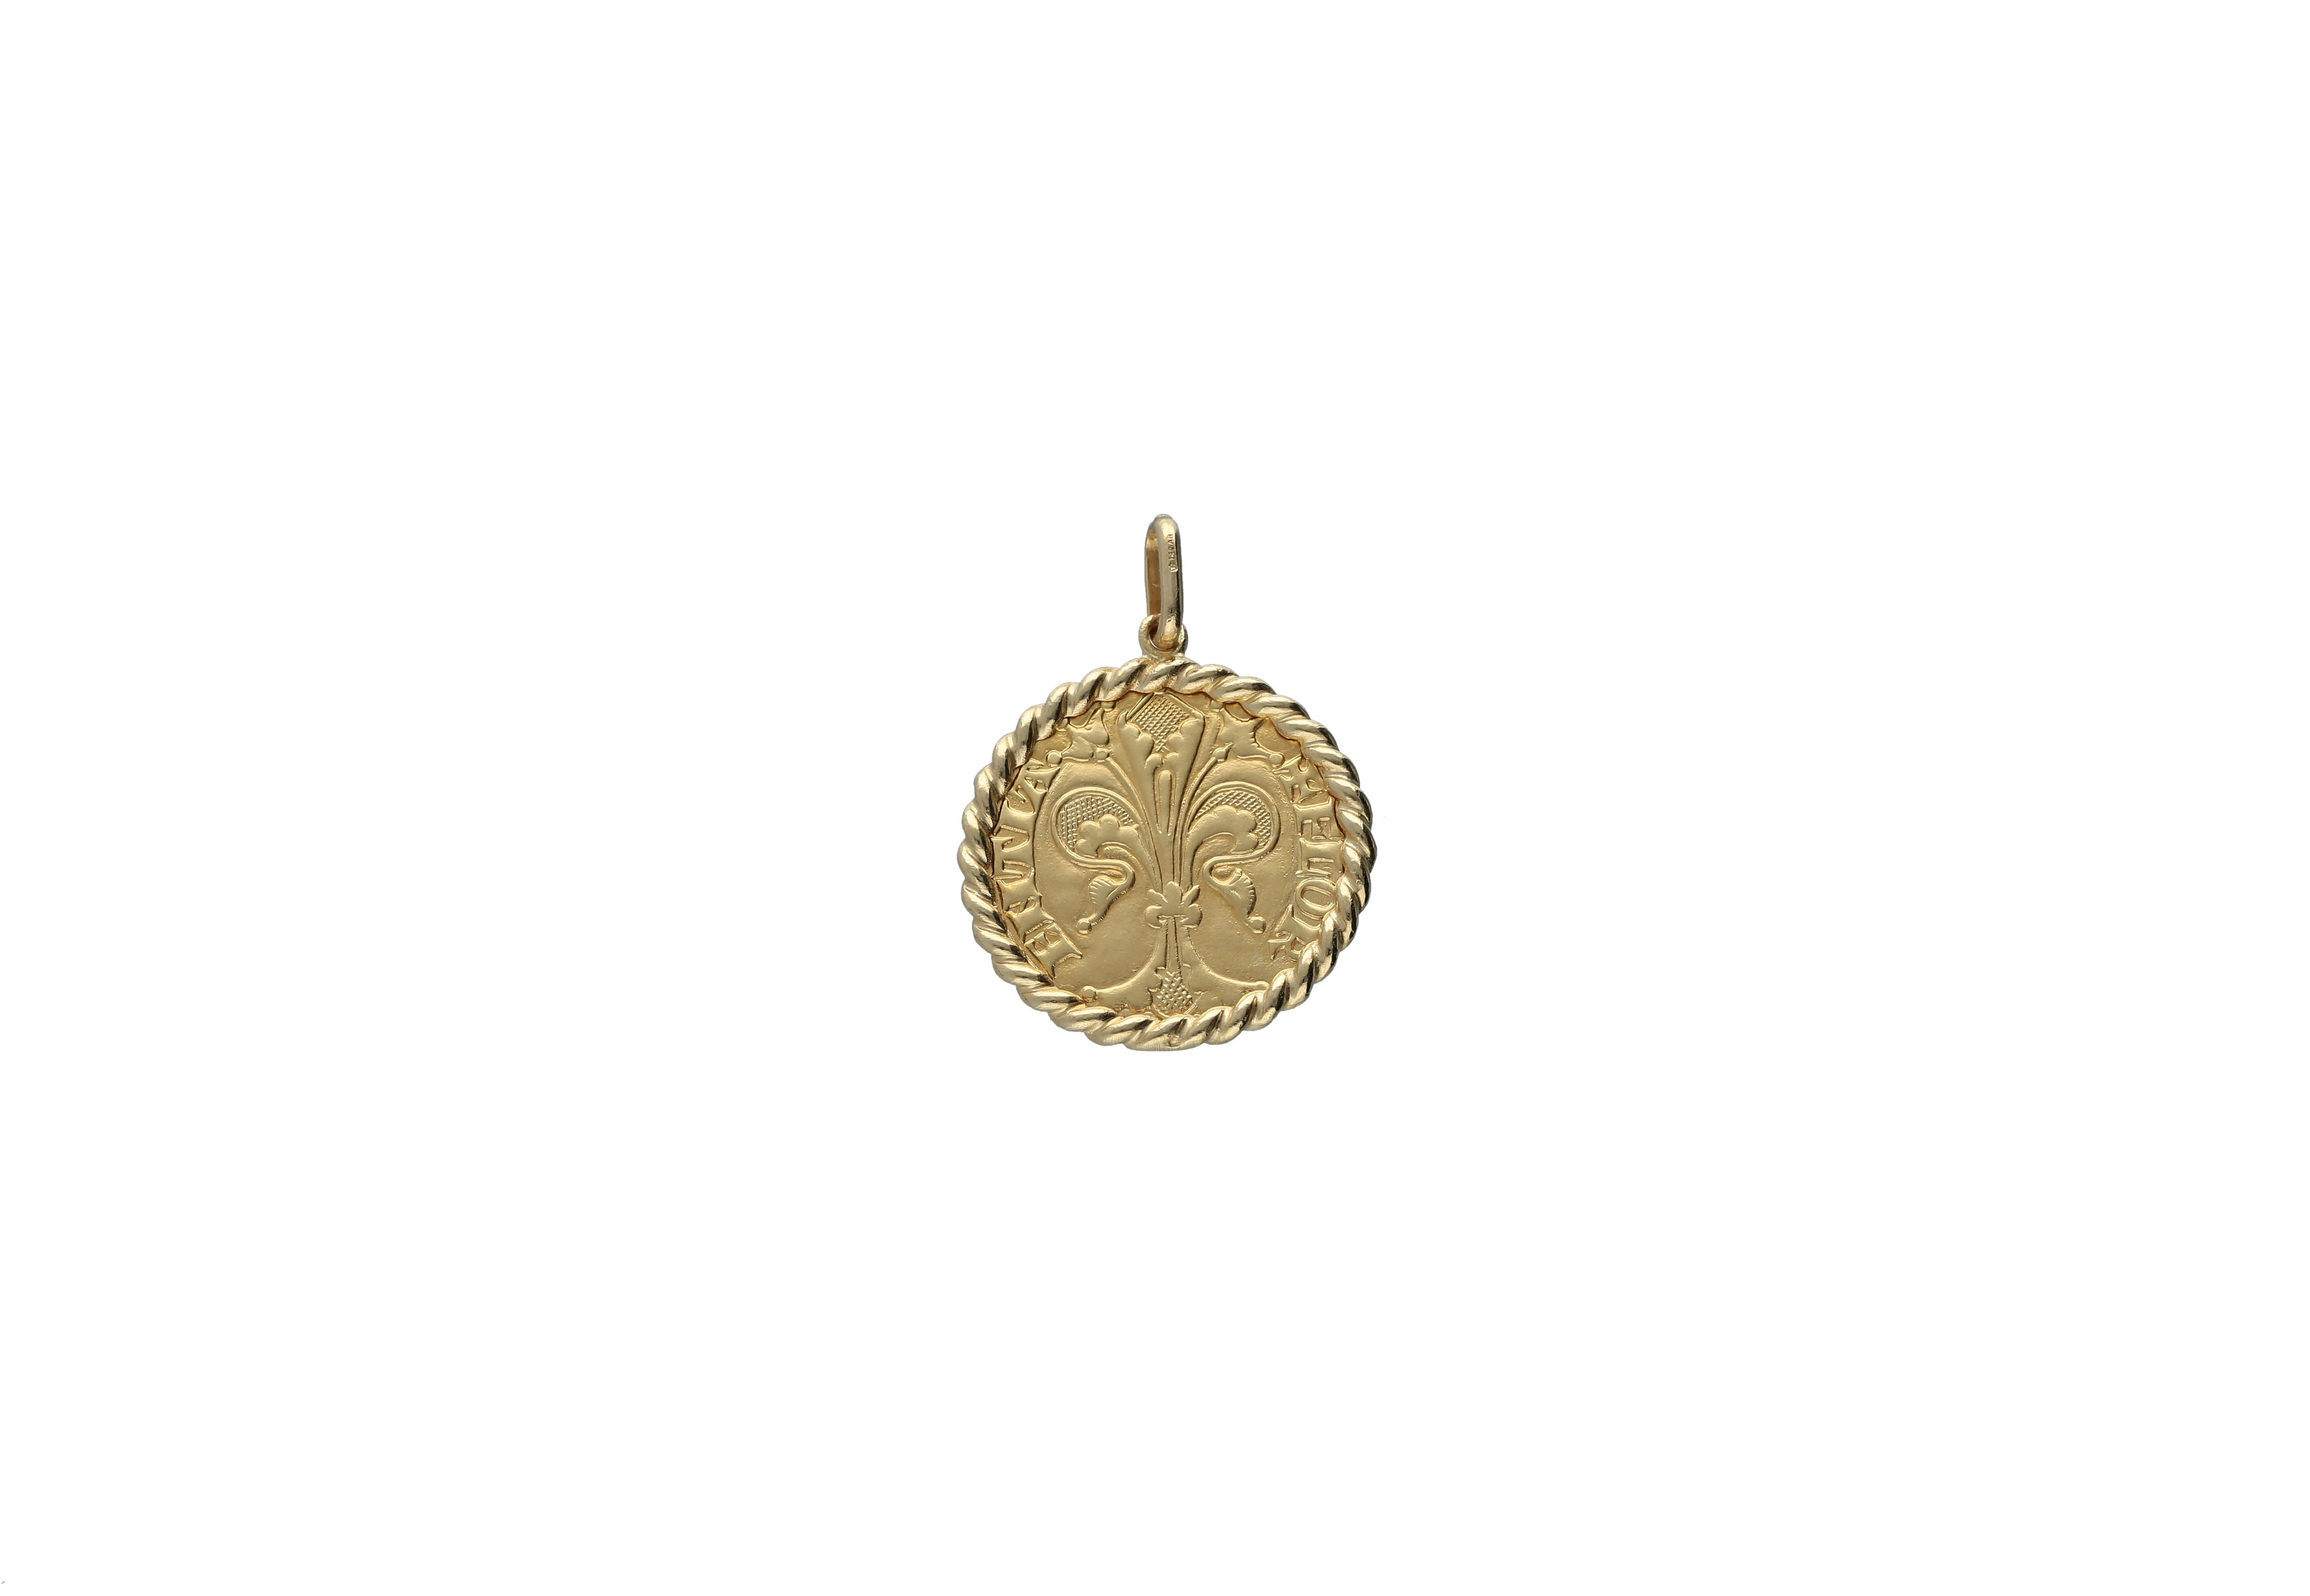 Pendant Charm Florentine coin fiorino in 18kt gold